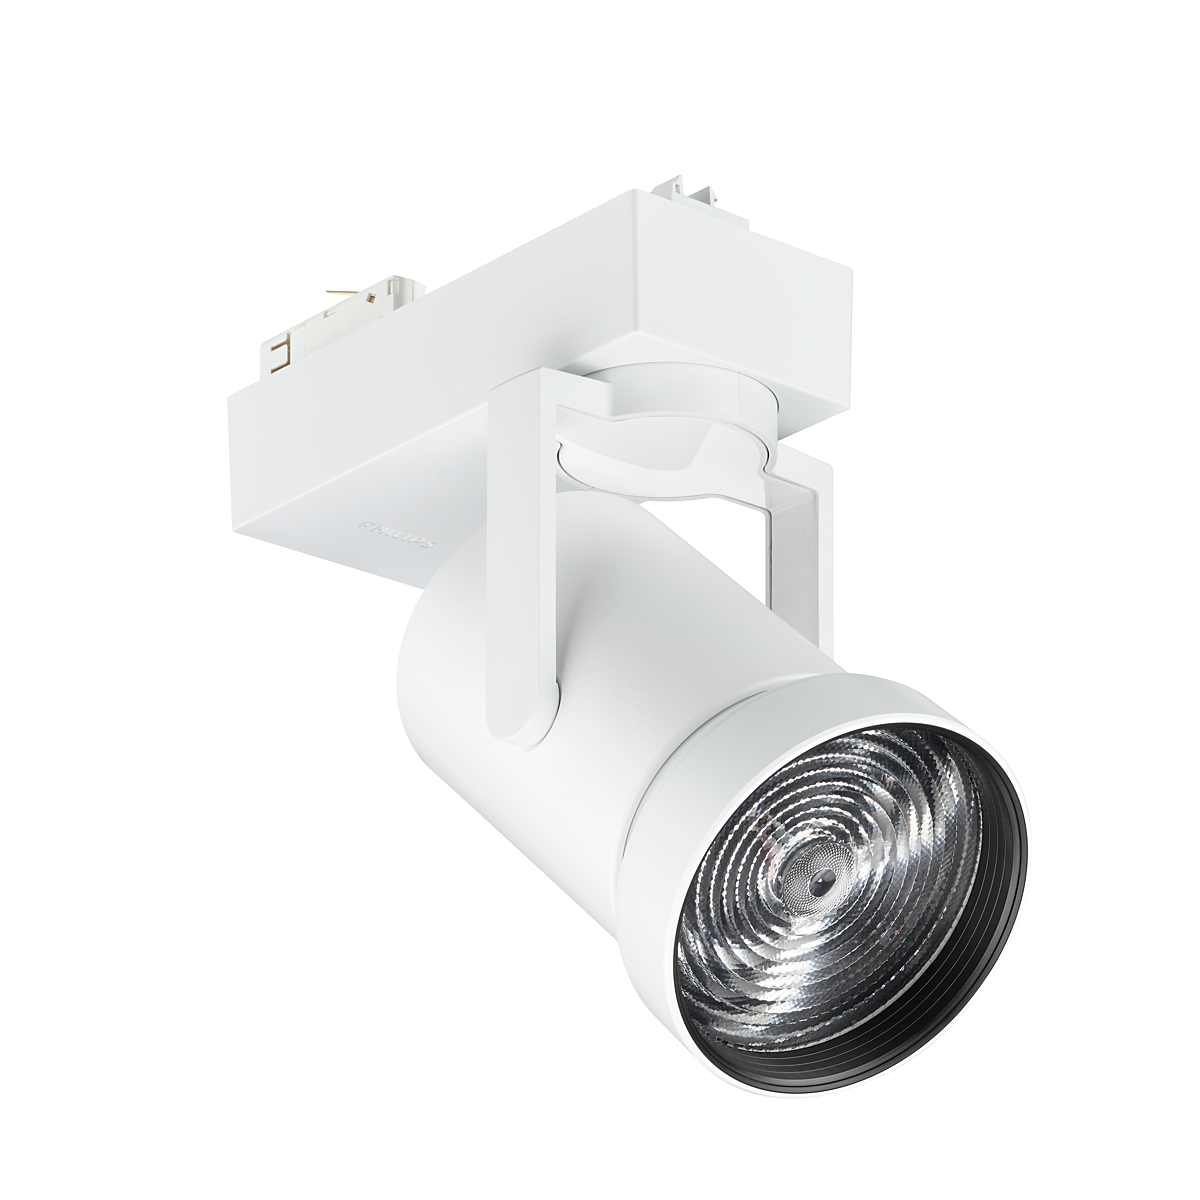 ST721T LED-XNB/PW9-3000 PSD CLM6 WH